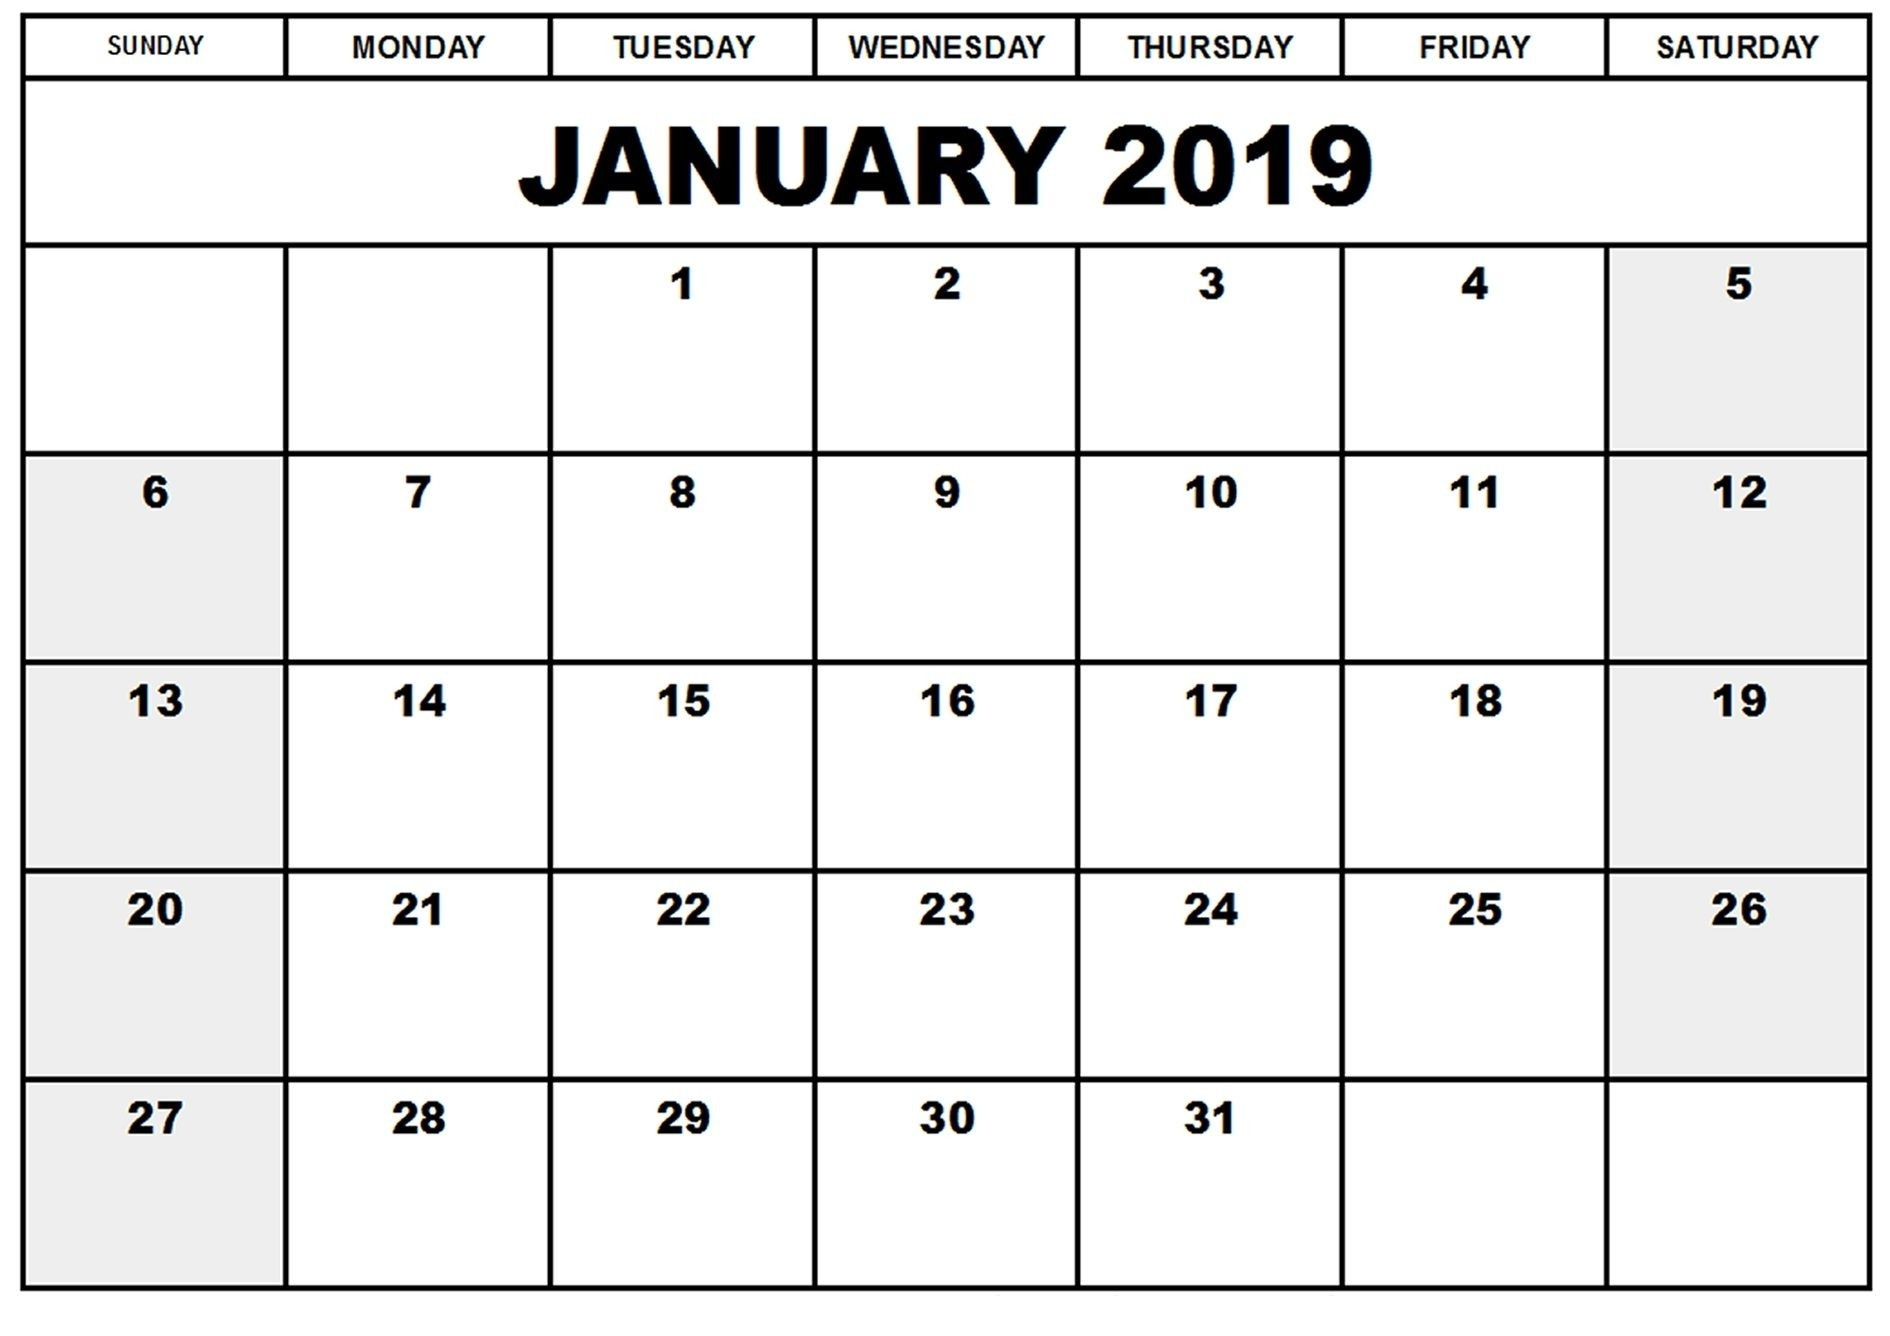 January 2019 Calendar Printable Daily #january2019Calendar-Excel Template Countdown Calendar